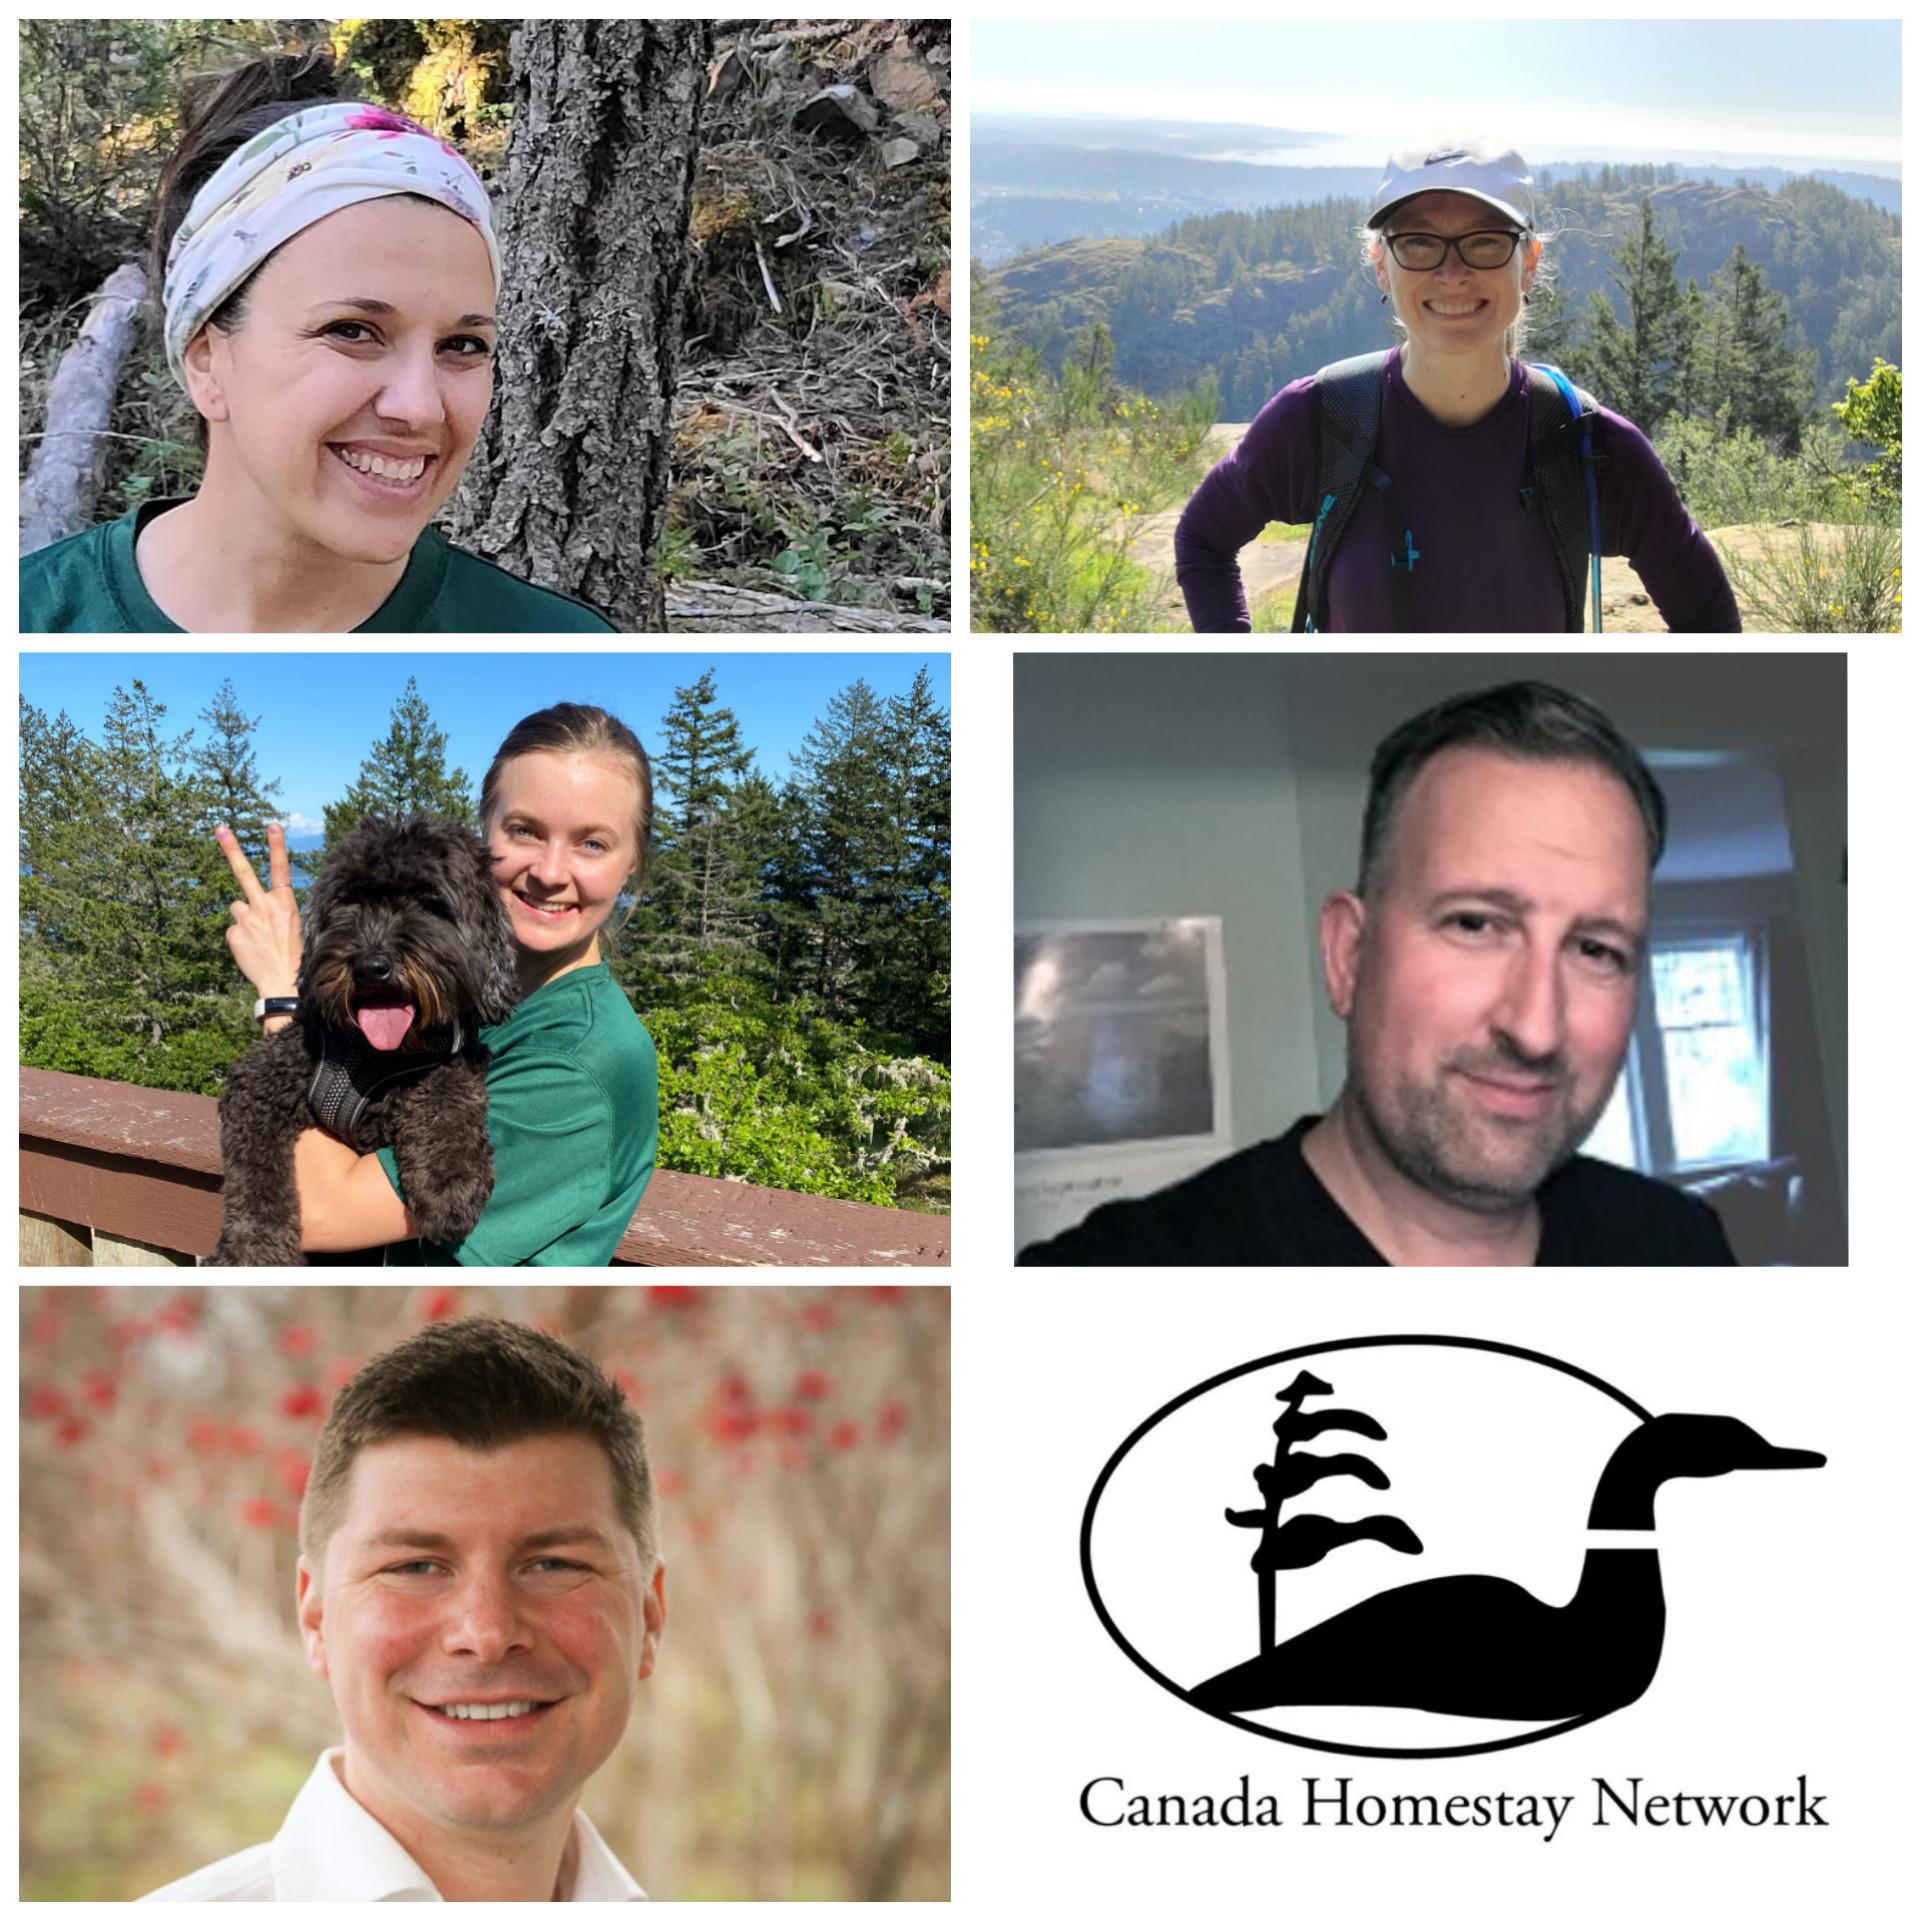 Canada Homestay Network West